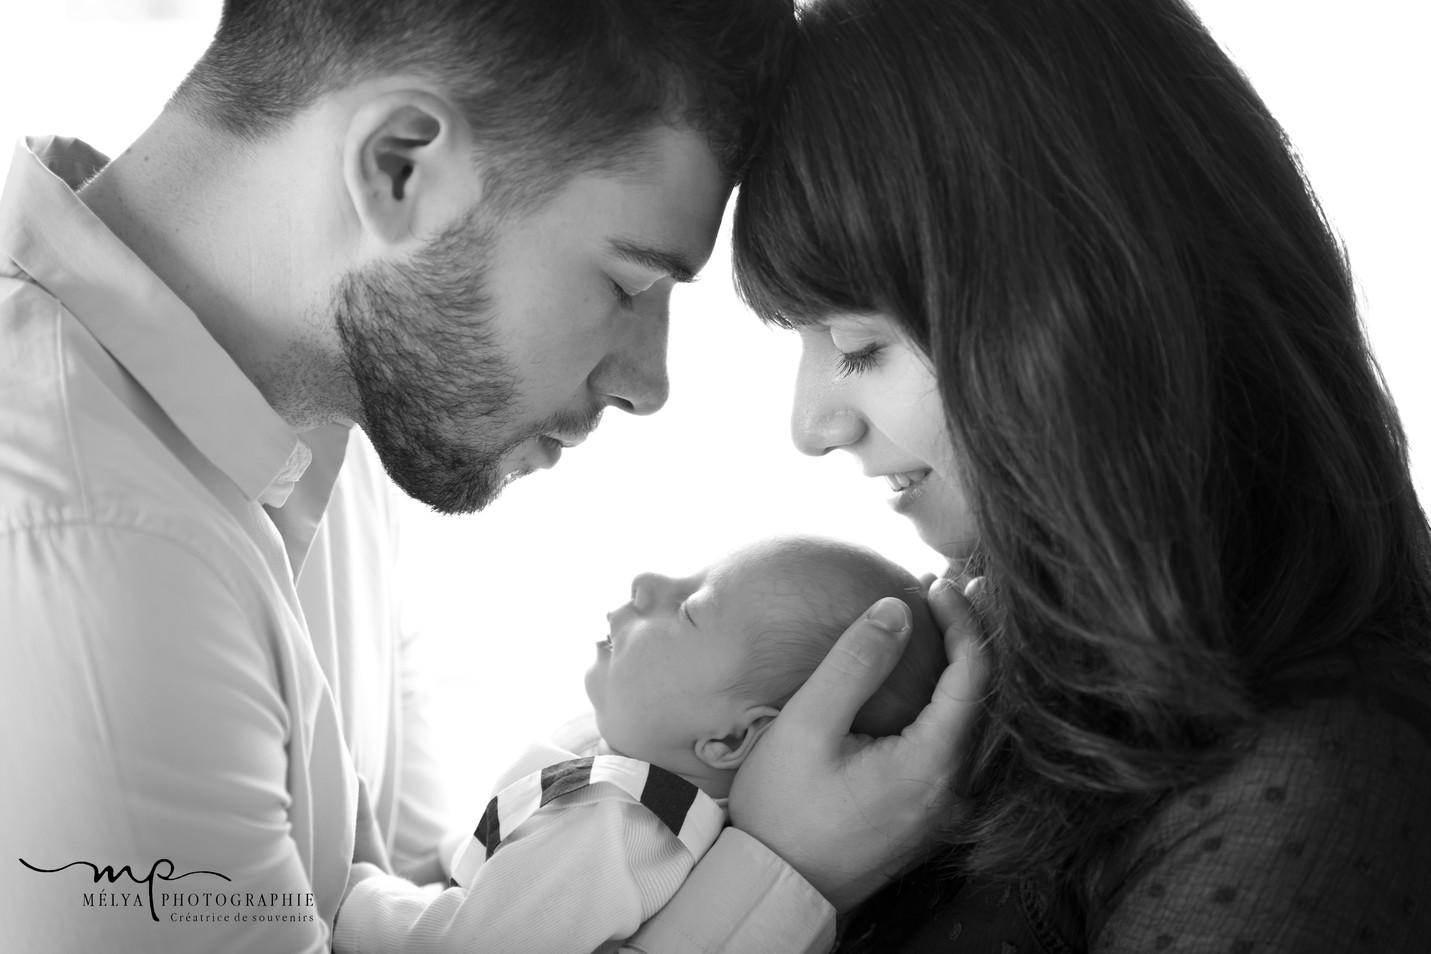 séance photo naissance mélya photographie